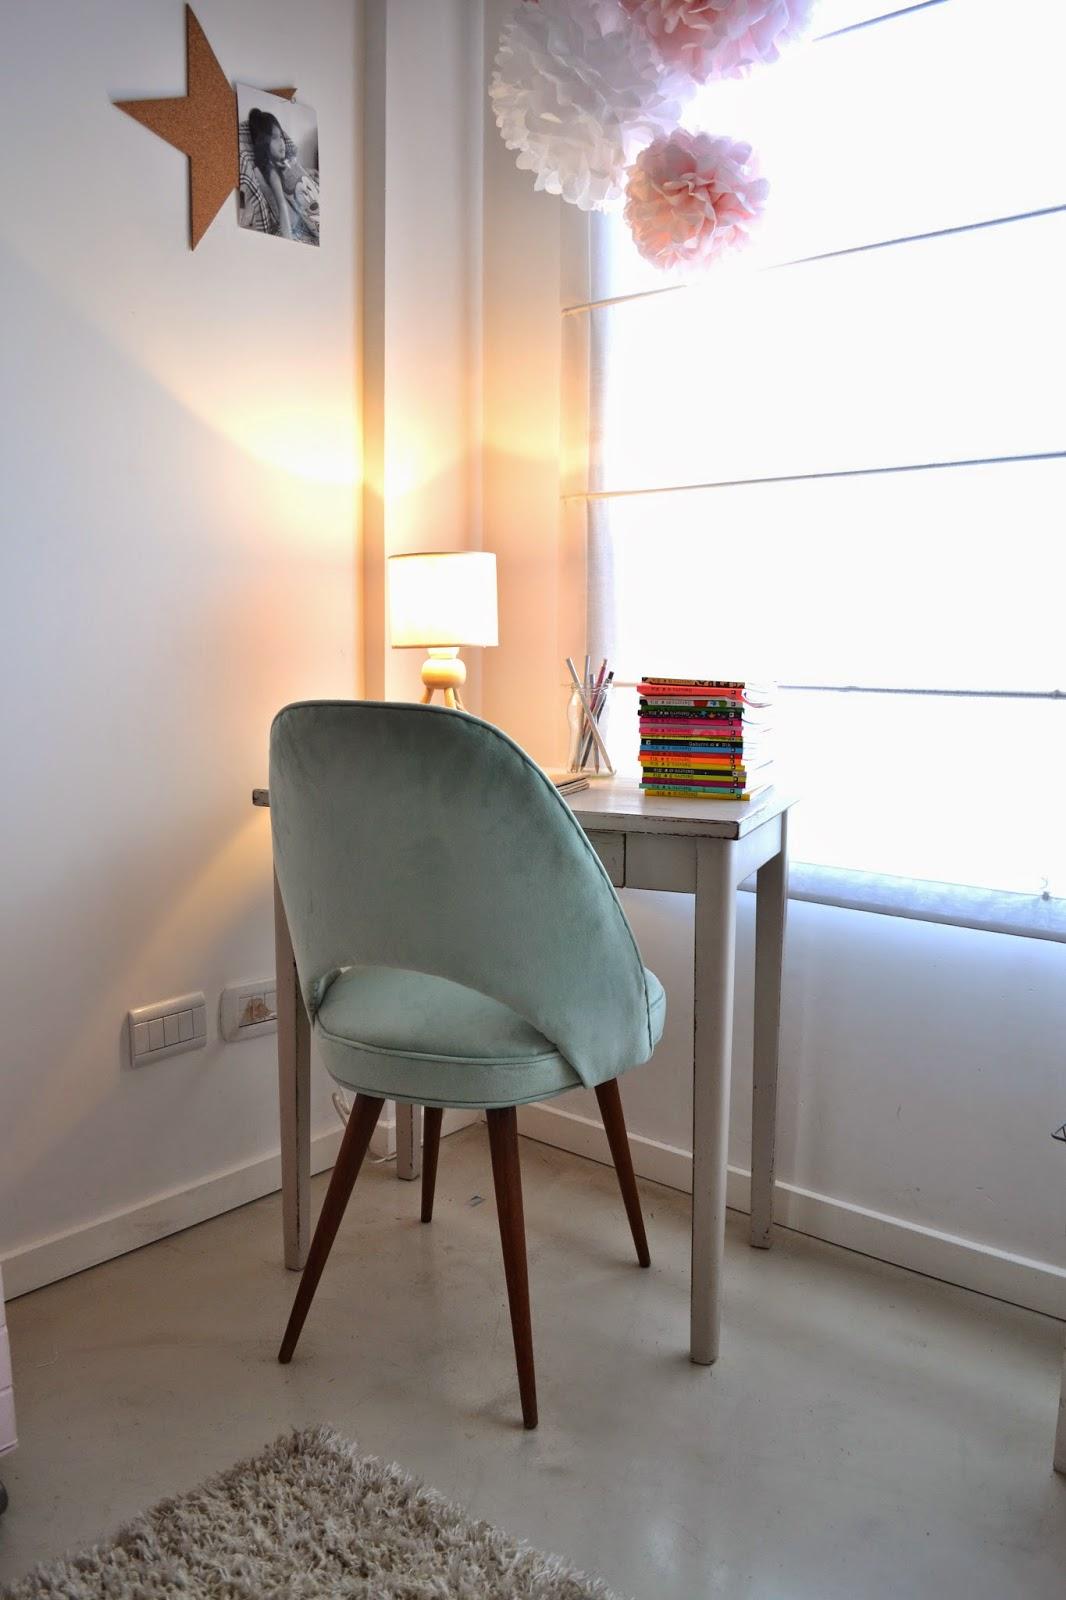 alma deco buenos aires lampara delfina. Black Bedroom Furniture Sets. Home Design Ideas